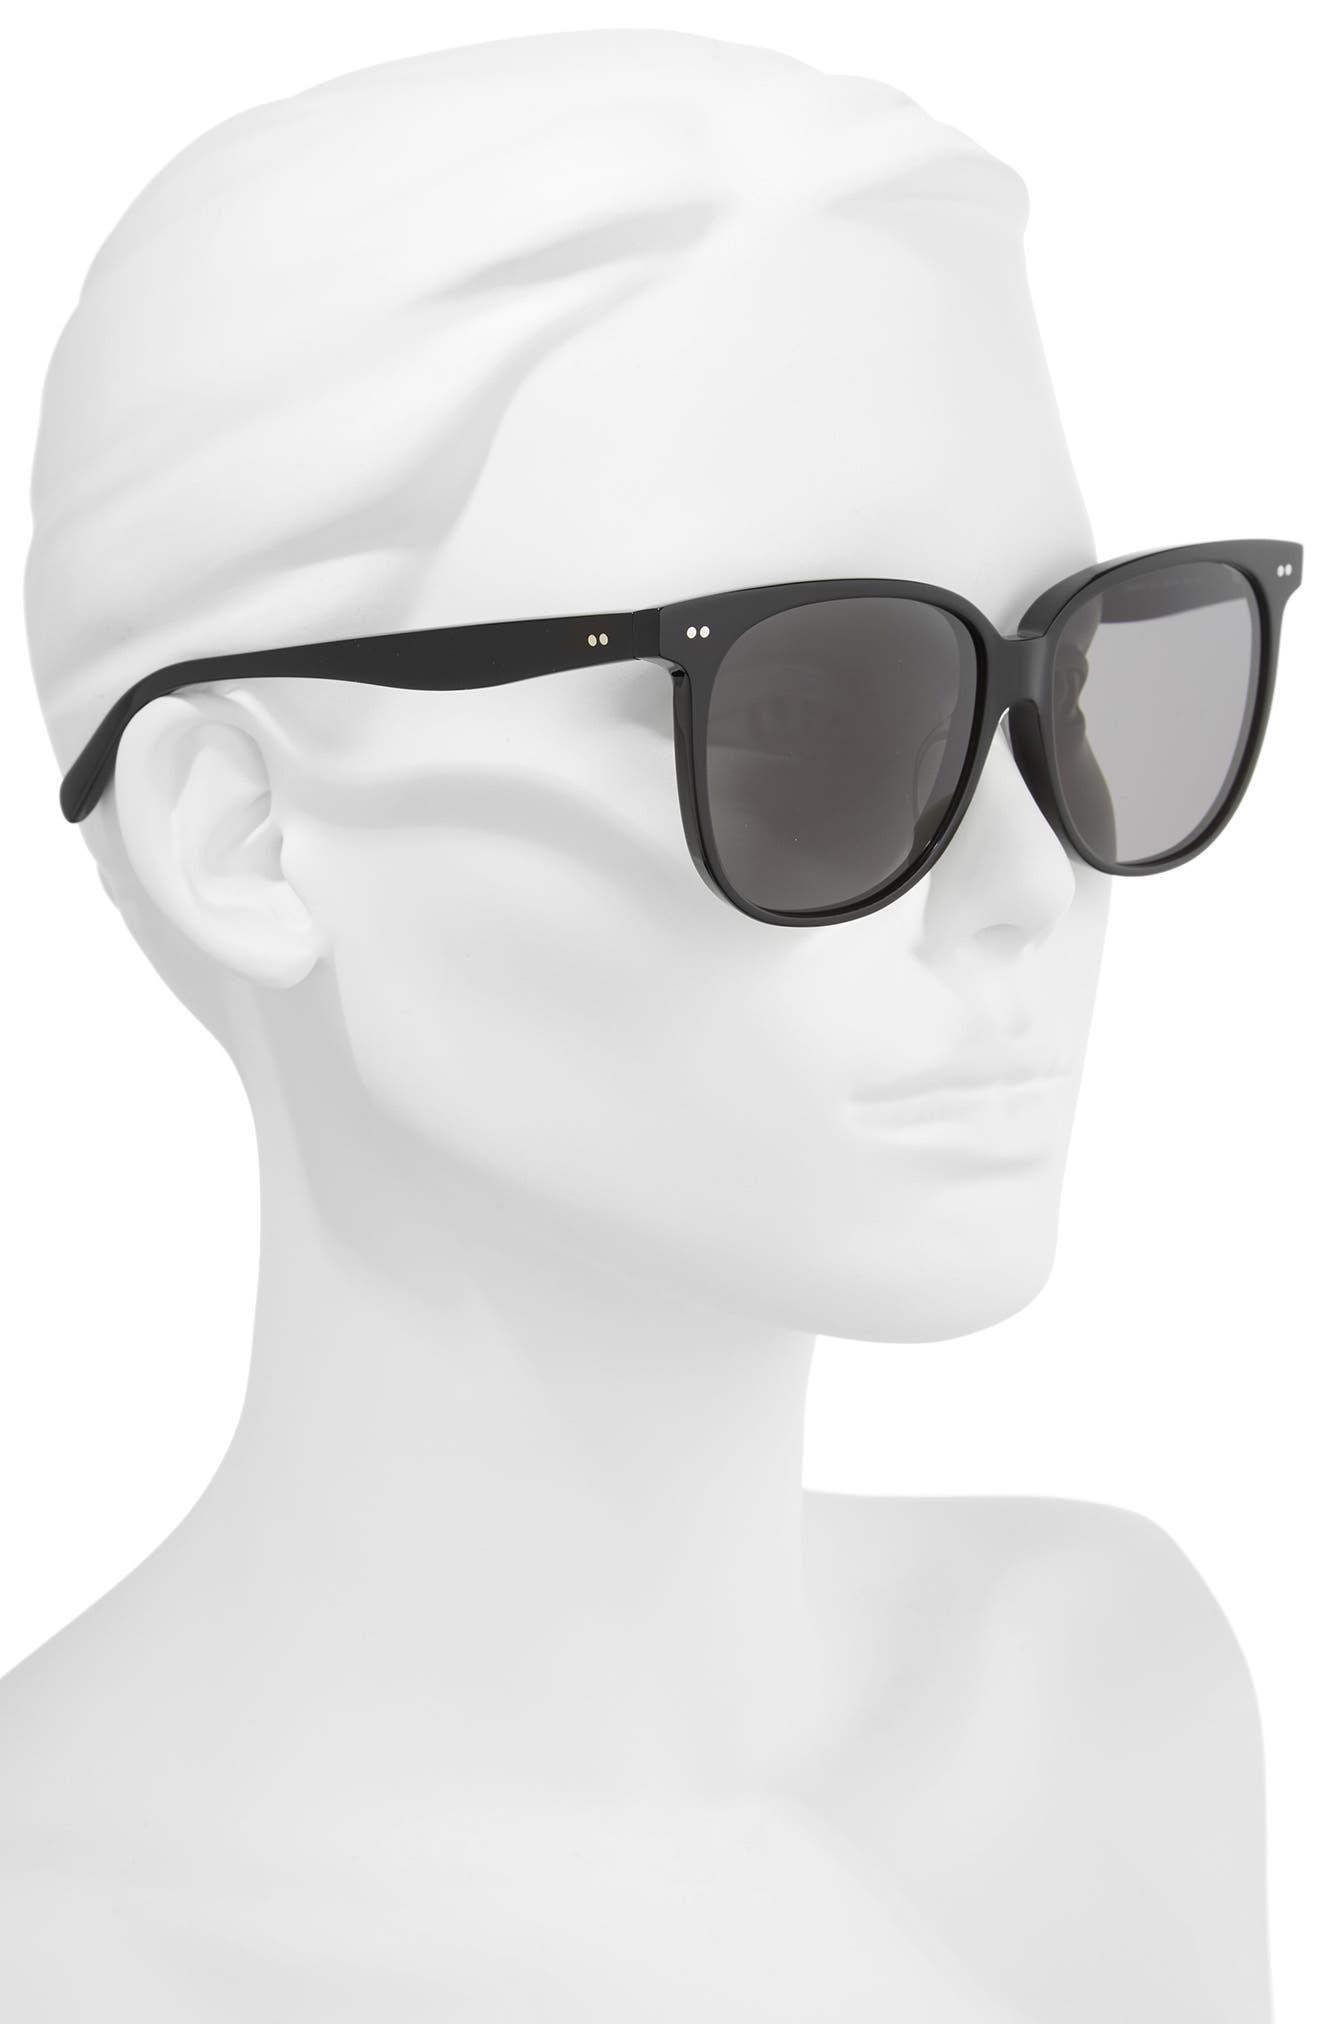 Special Fit 58mm Square Sunglasses,                             Alternate thumbnail 2, color,                             BLACK/ SMOKE